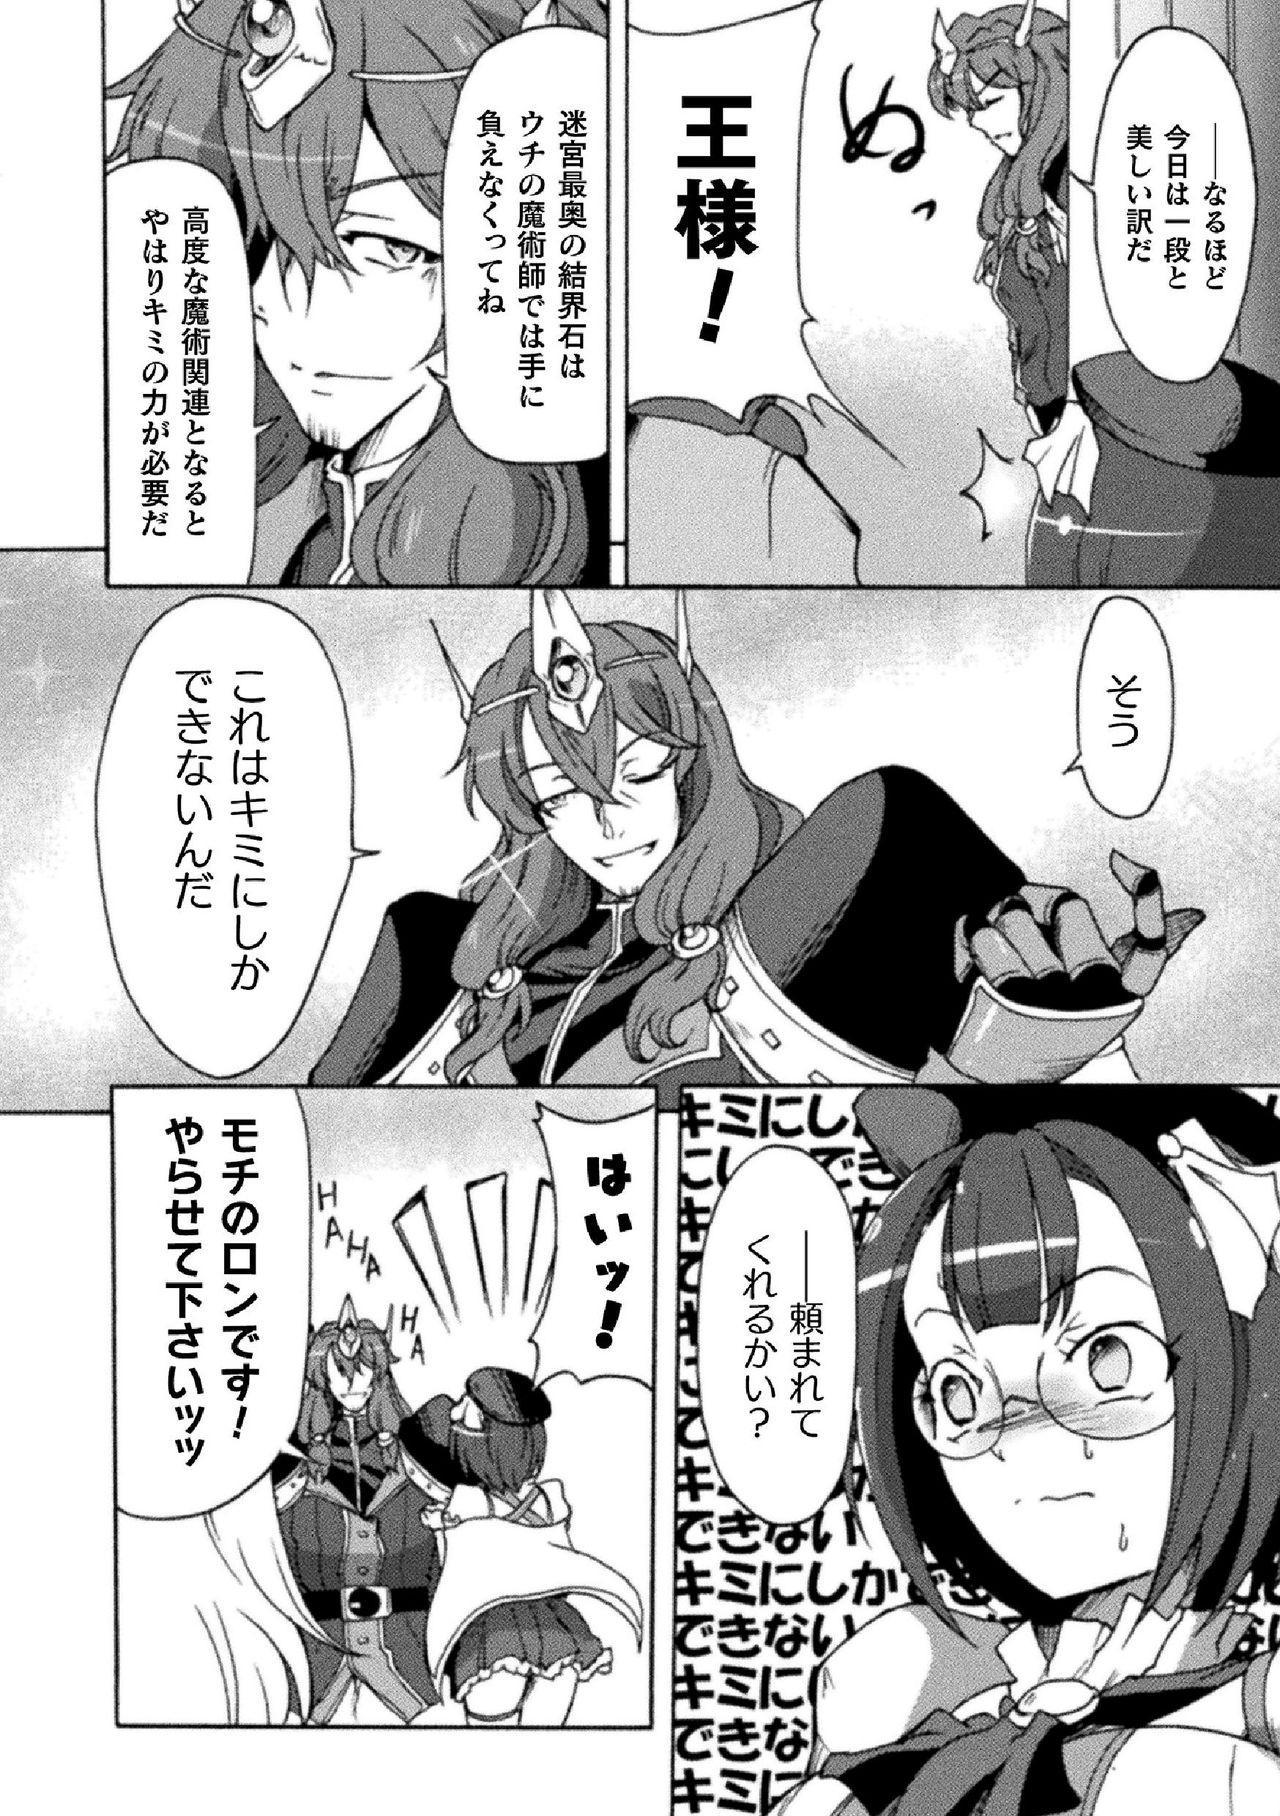 2D Comic Magazine Namaiki Onna ni HaraPun Seisai! Vol. 2 23